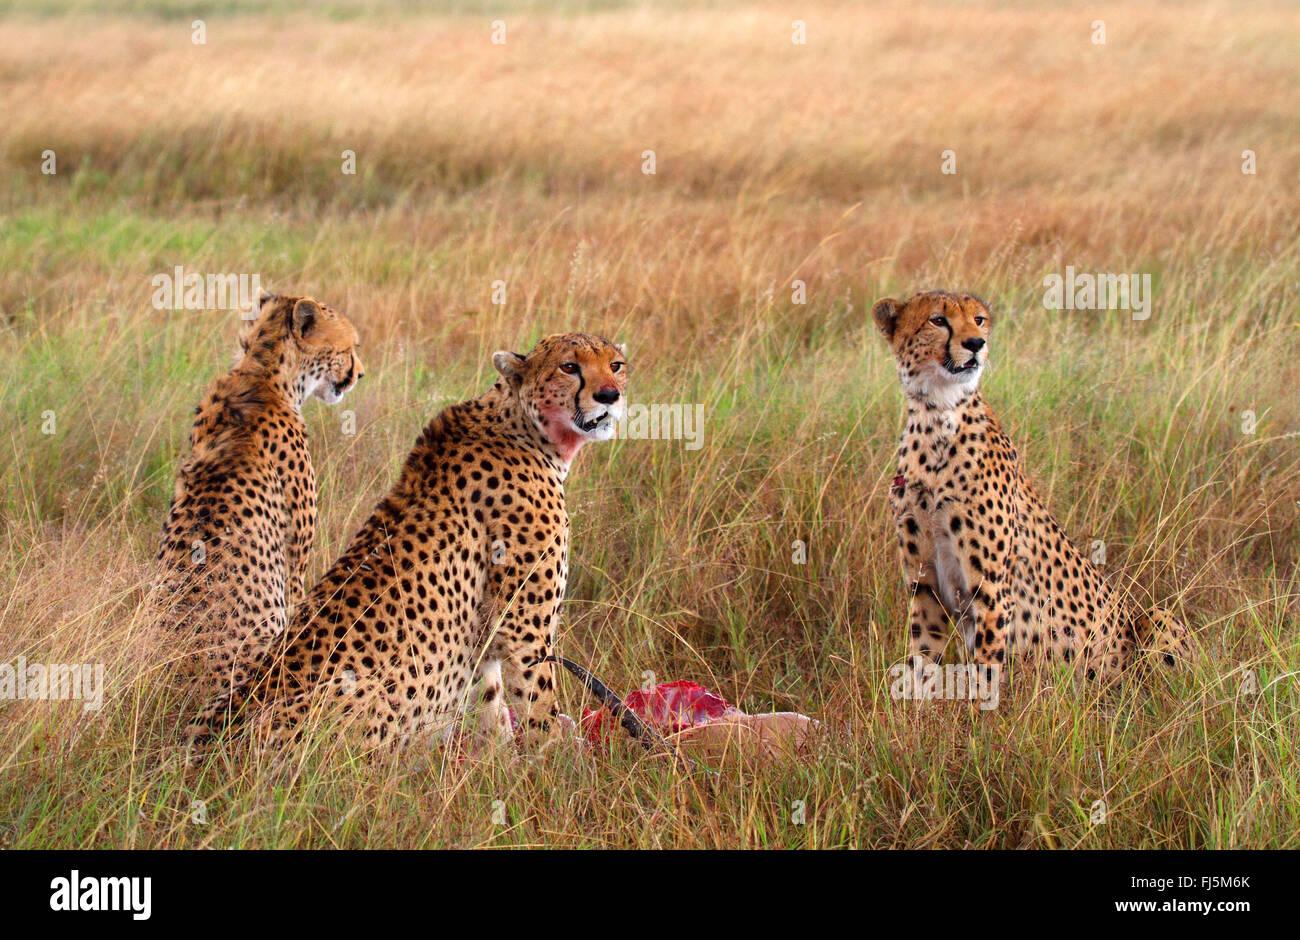 Gepard (Acinonyx Jubatus), drei wachsamen Geparden Fütterung eine Jagd nach unten Gazelle, Kenia, Masai Mara Stockbild